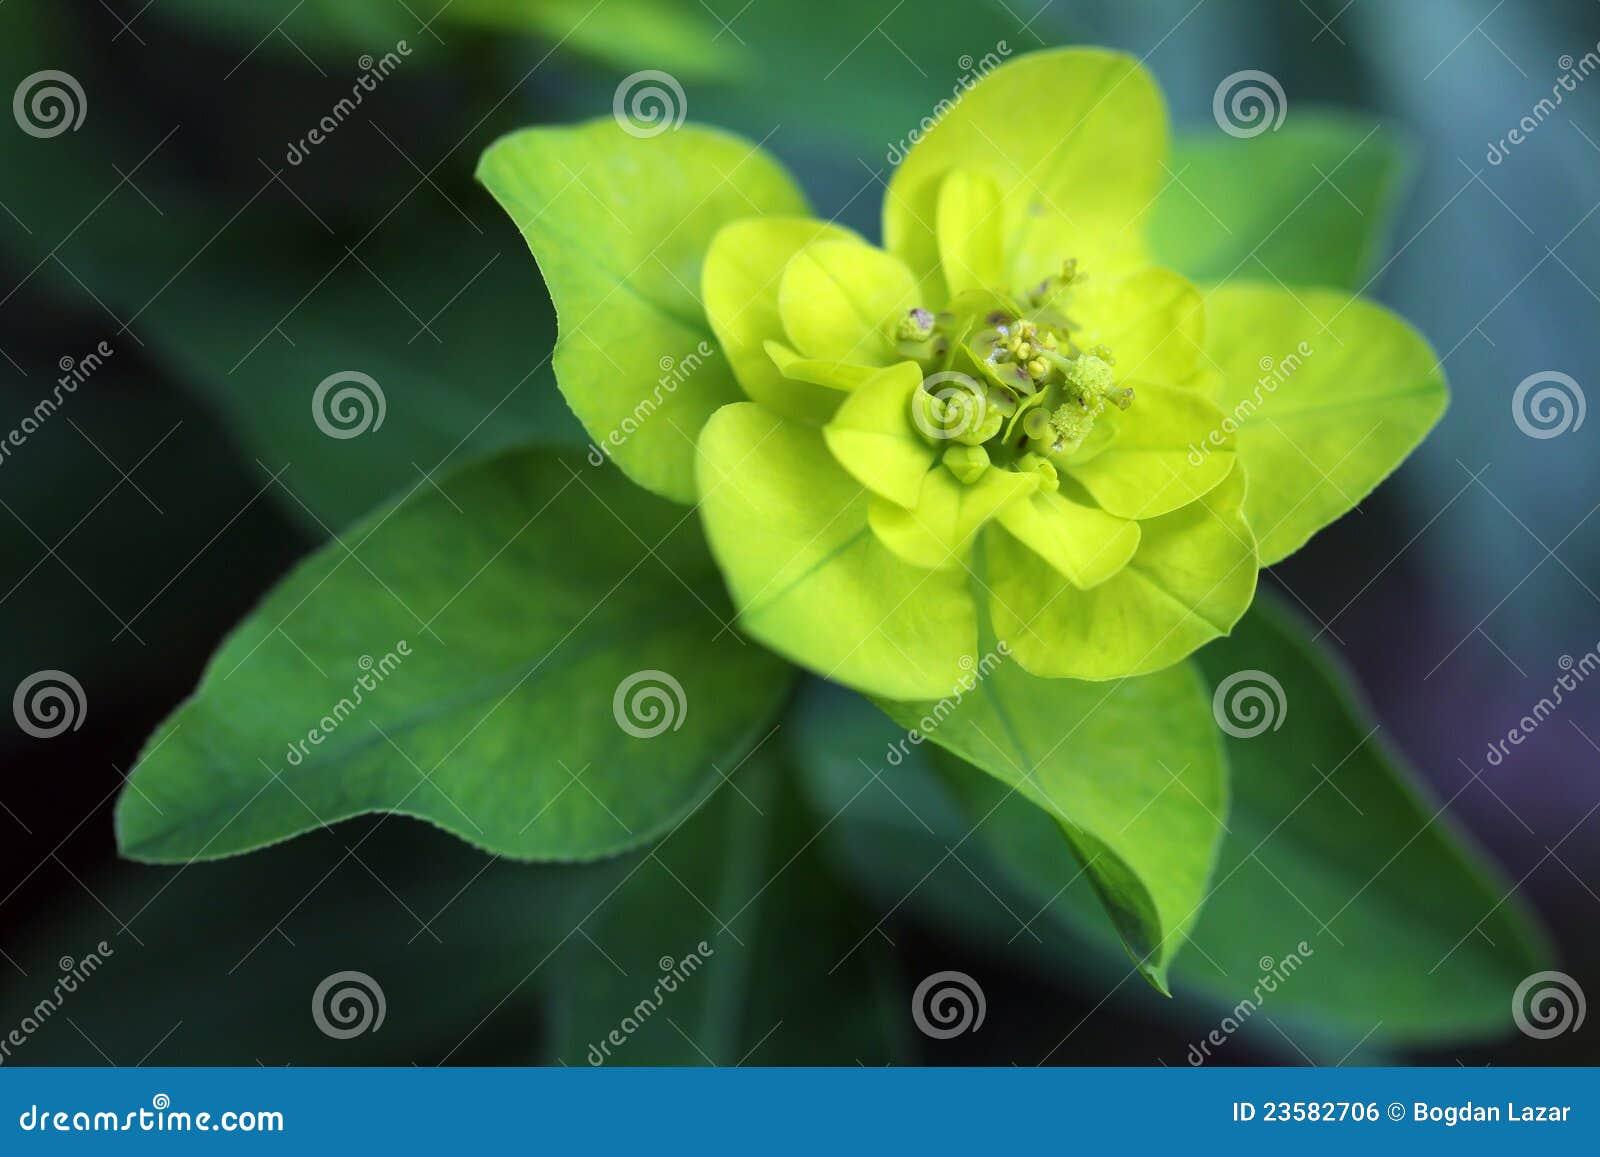 Download Euphorbia Palustris - Marsh Spurge Plant Stock Photo - Image of detail, decoration: 23582706